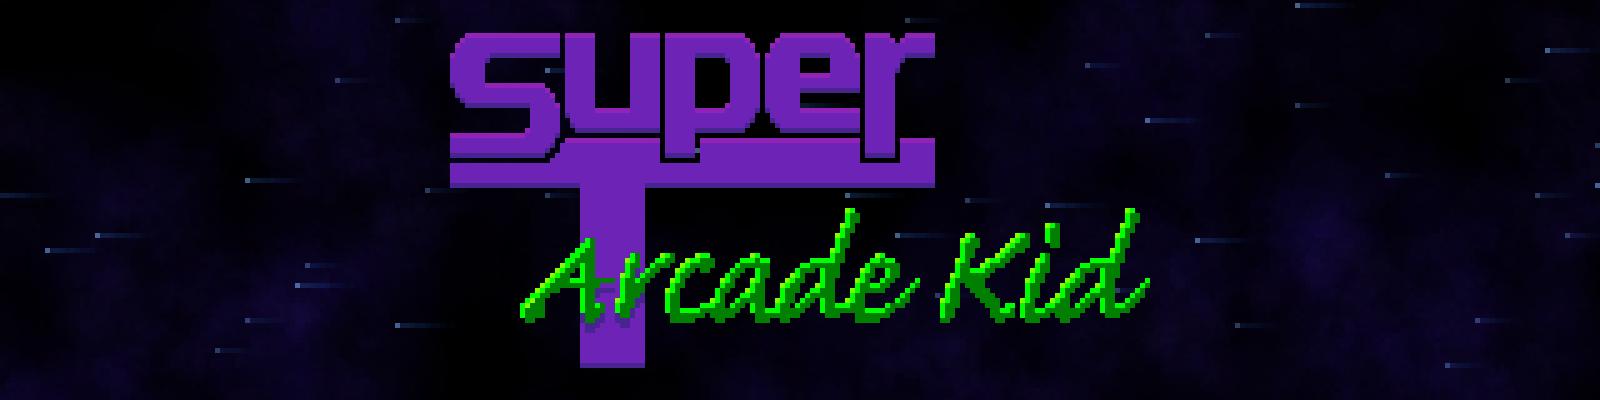 Super T: Arcade Kid